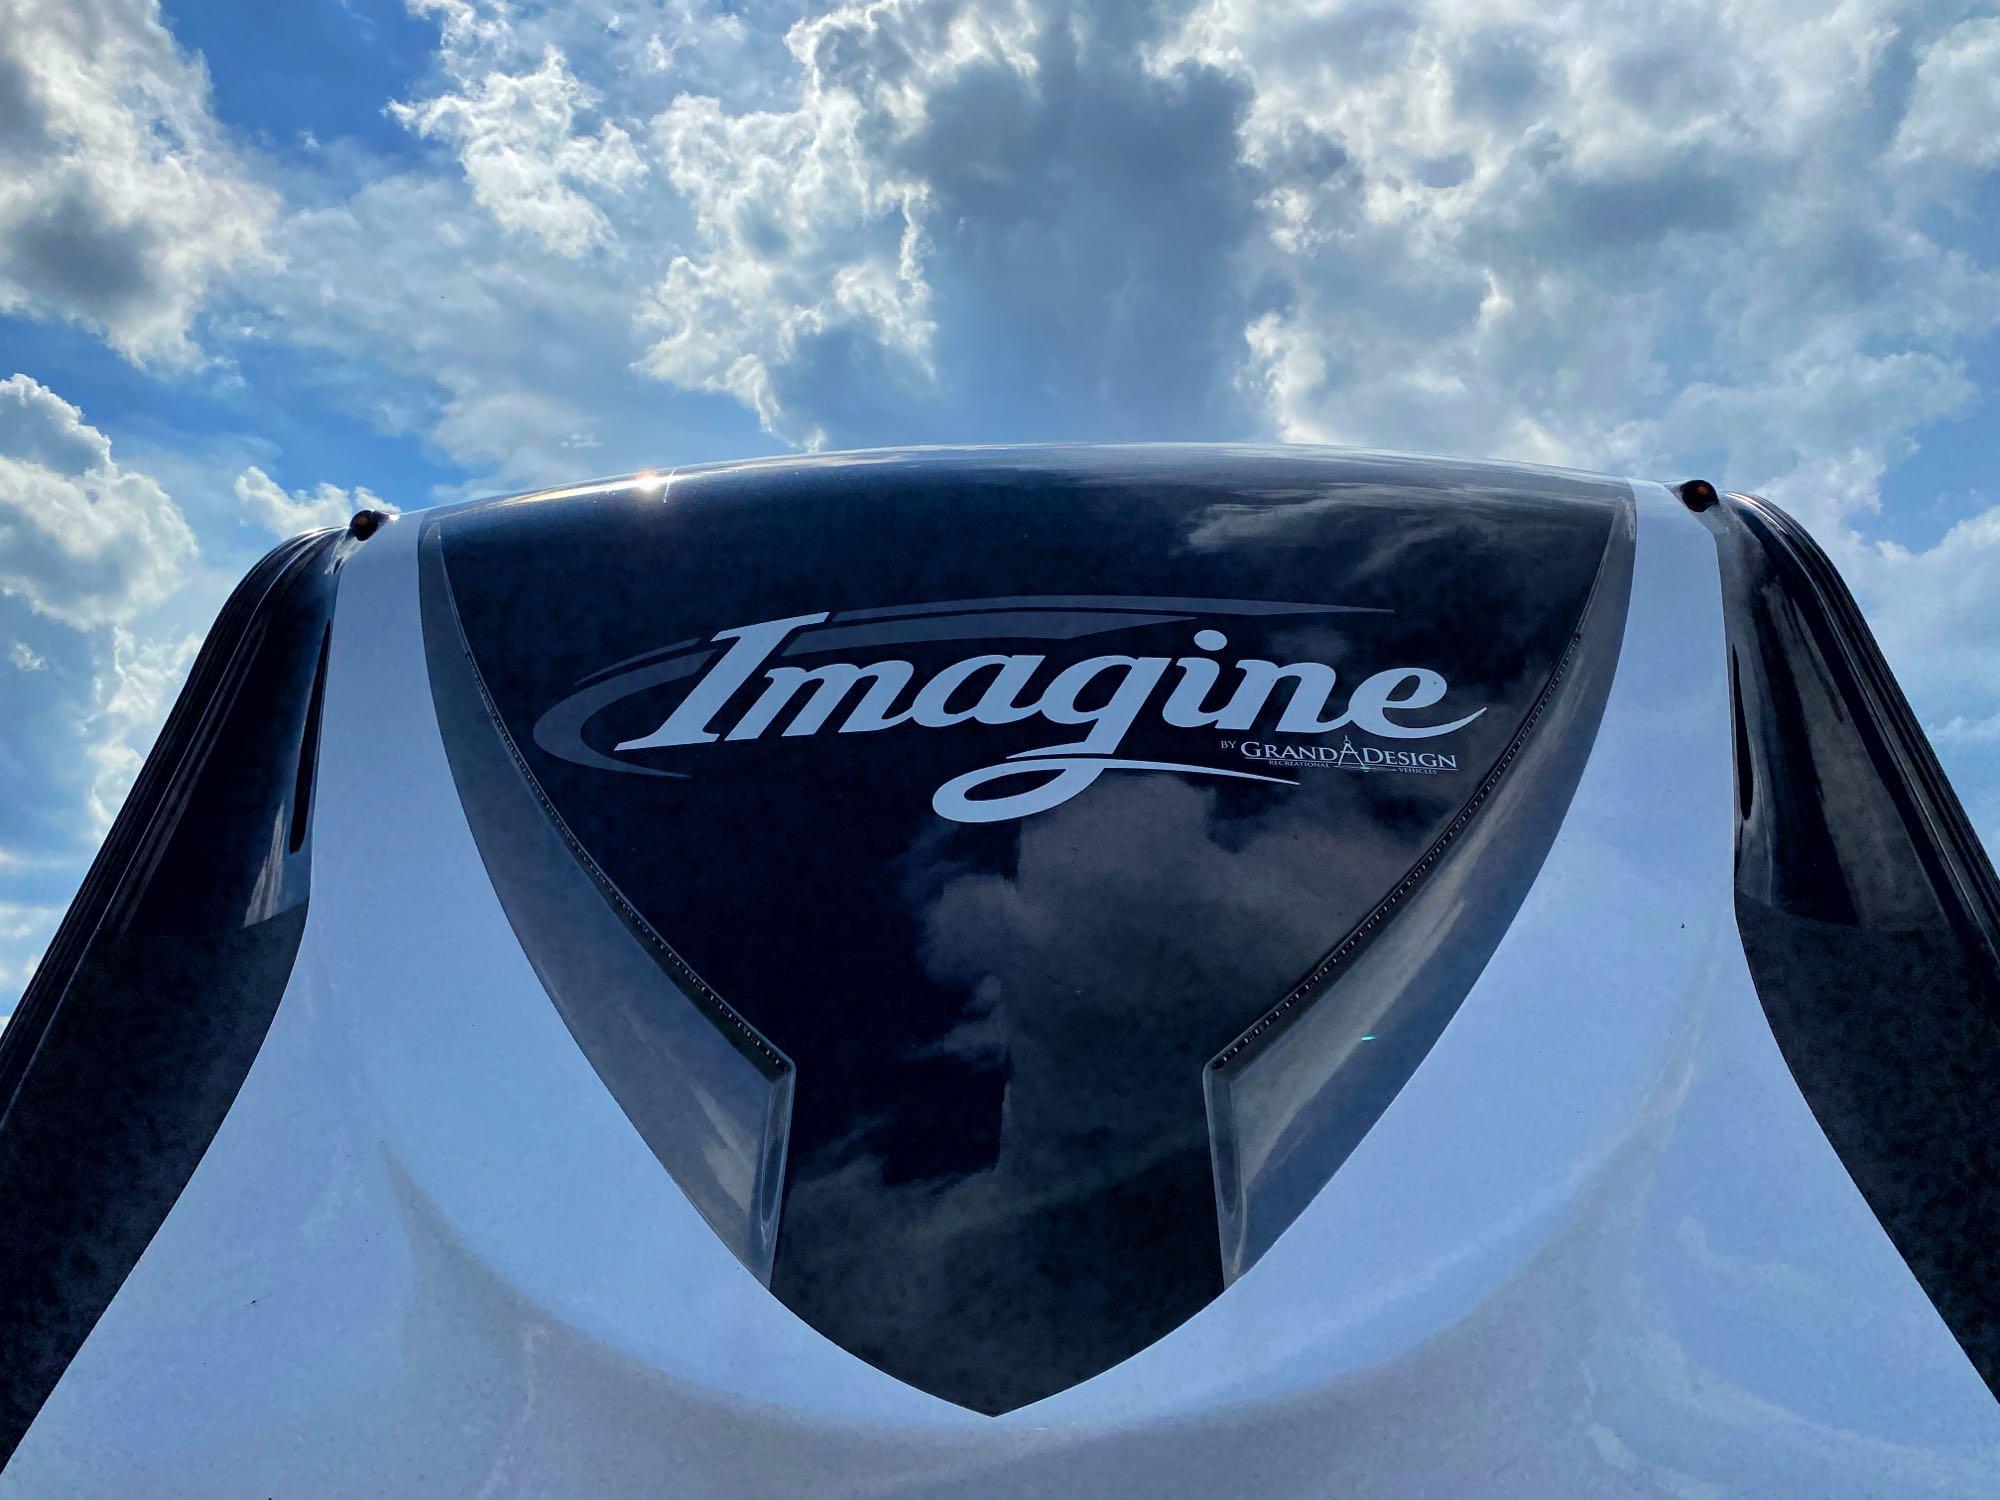 Grand Design Imagine 2020